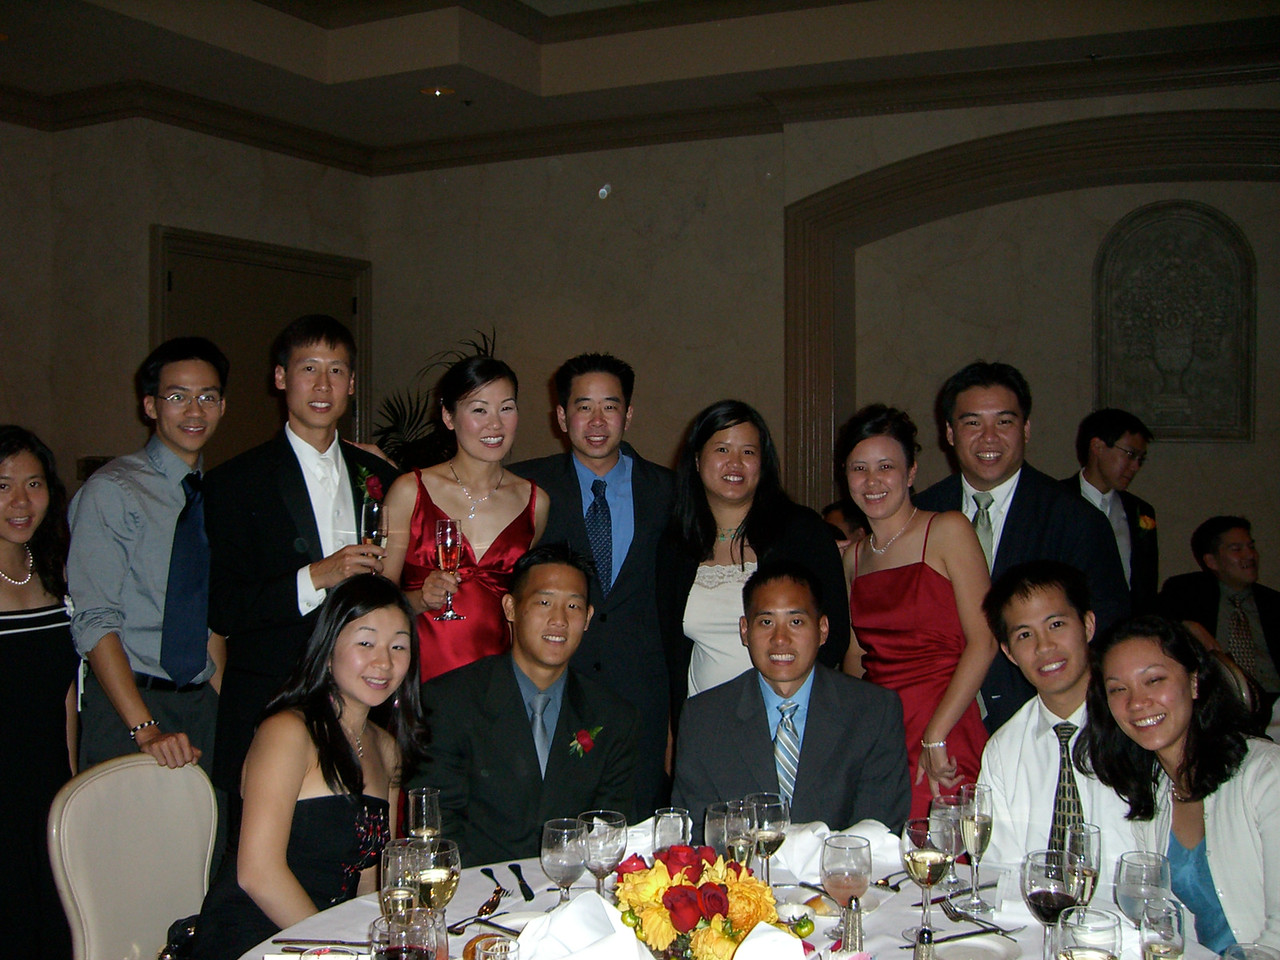 Table pic with bride & groom - EFC-Harvest Berkeley class of '99